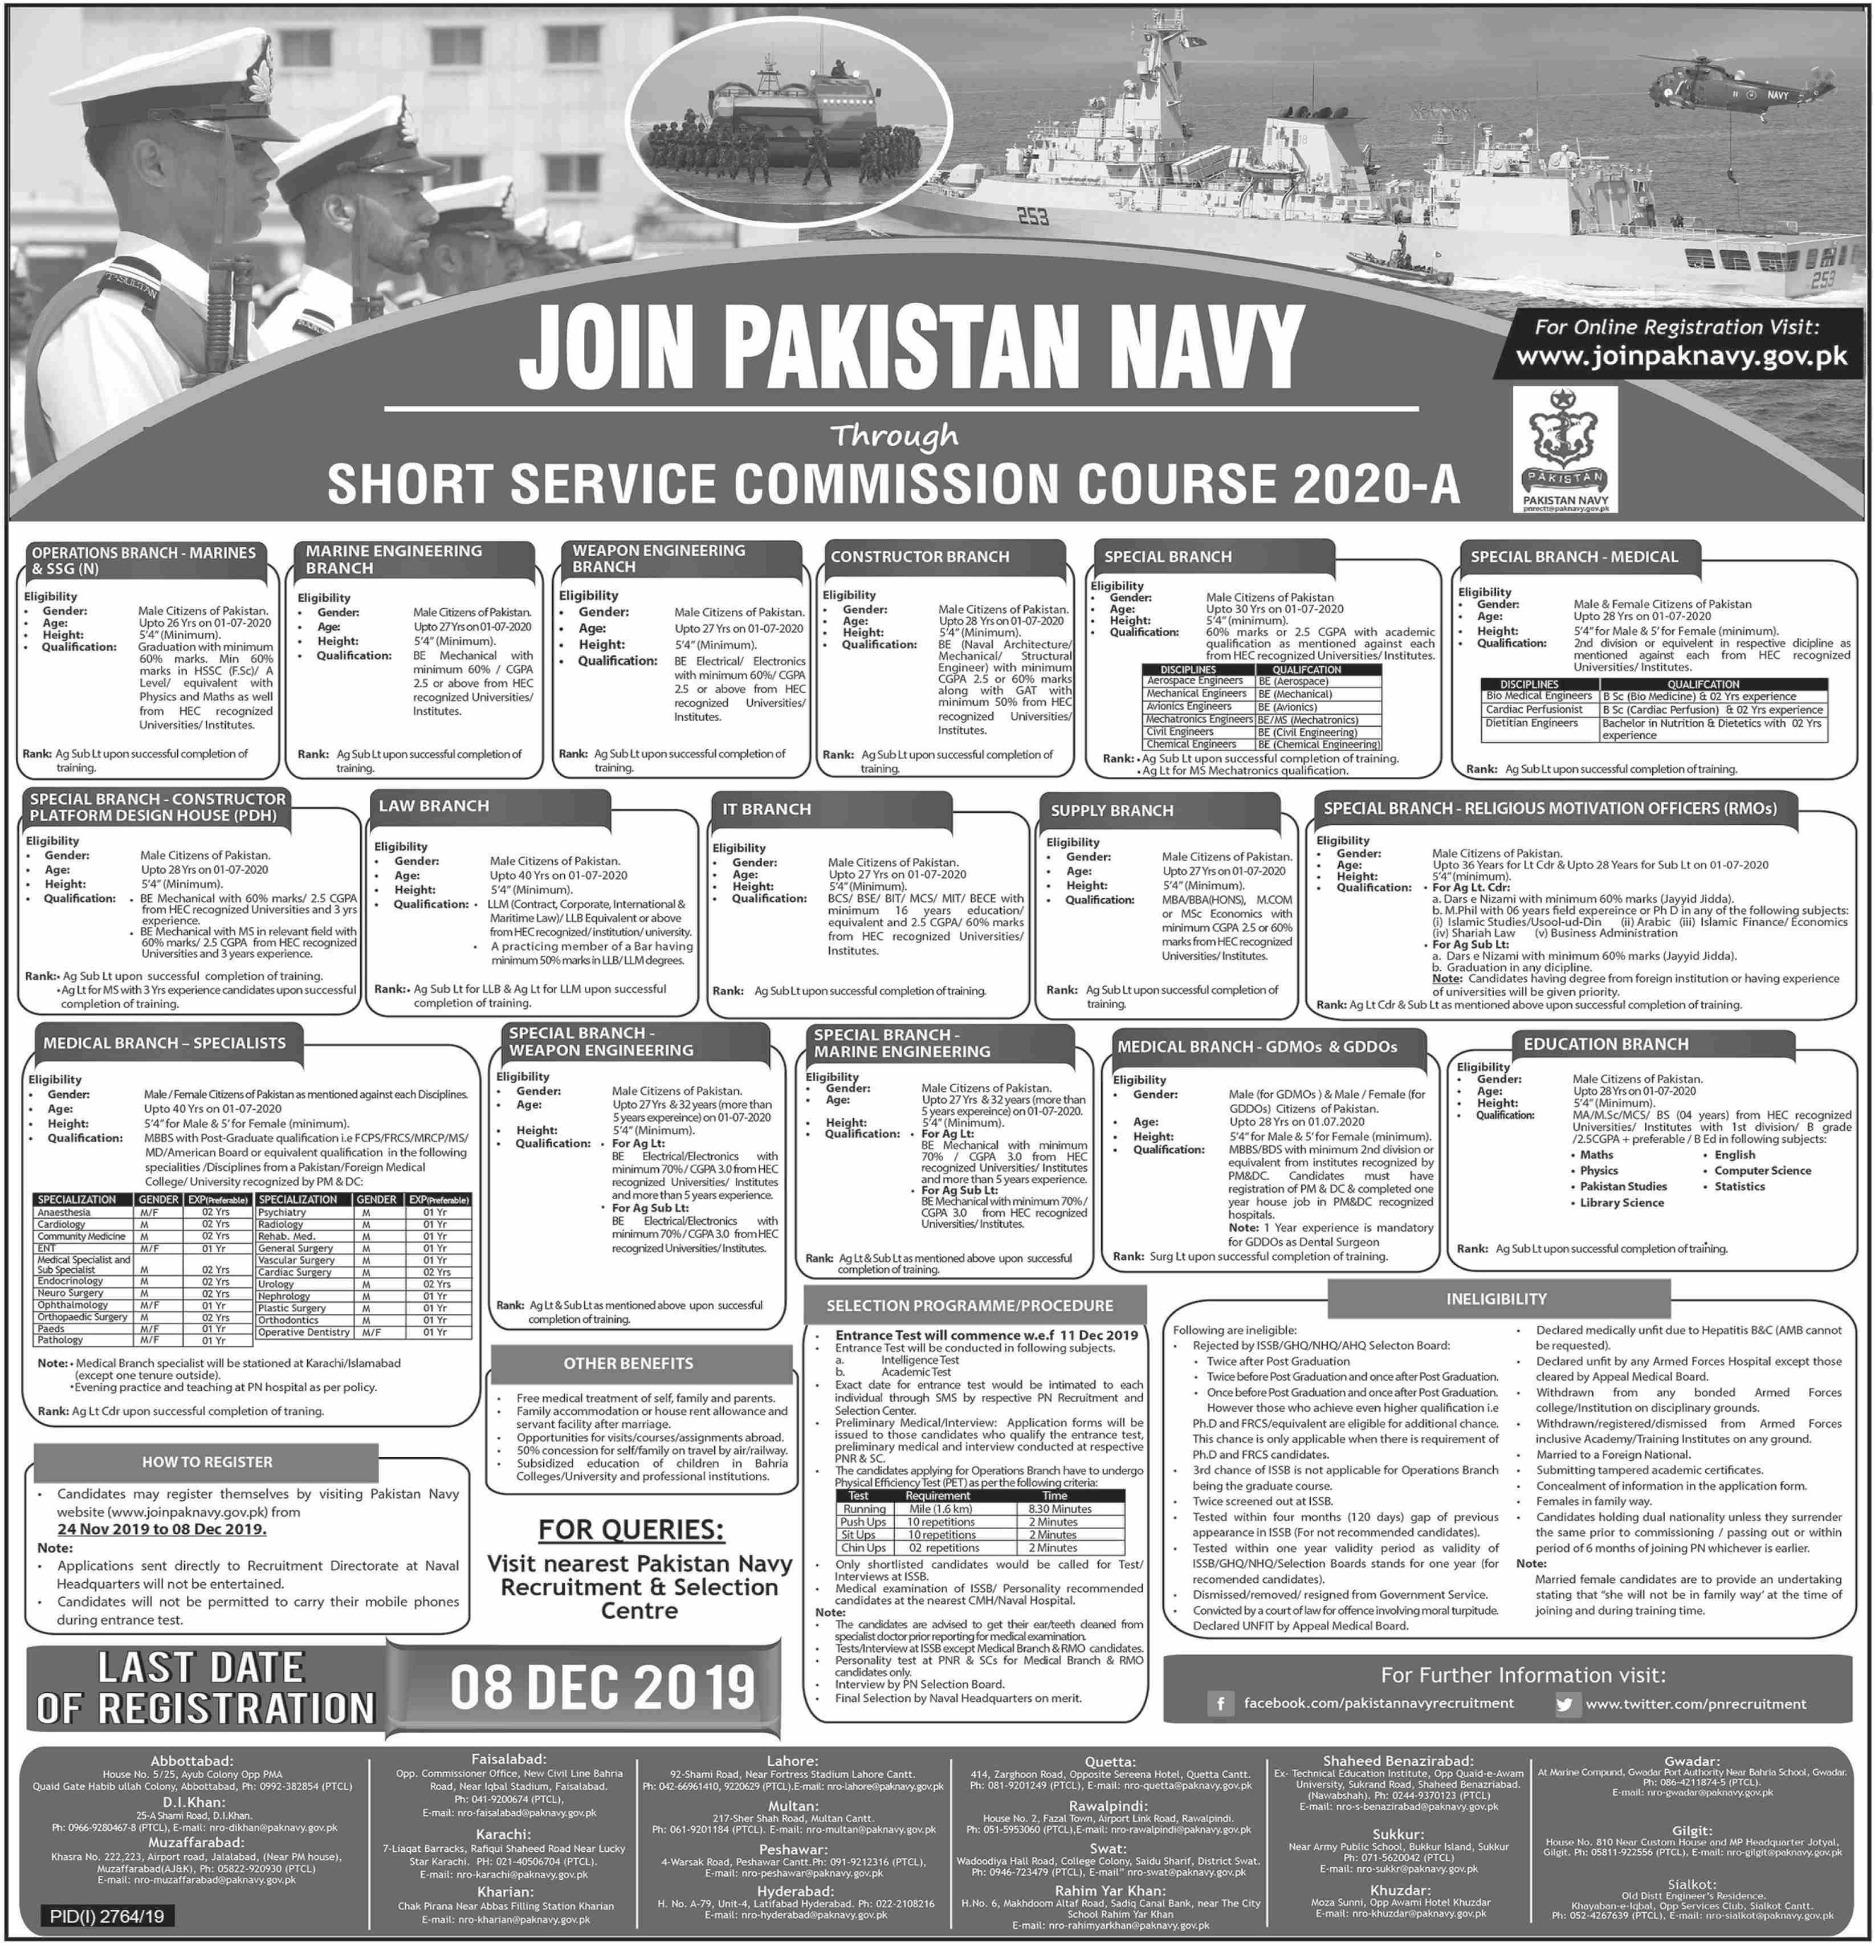 Join Pak Navy-Pakistan Navy Jobs through SSCC 2020-A.